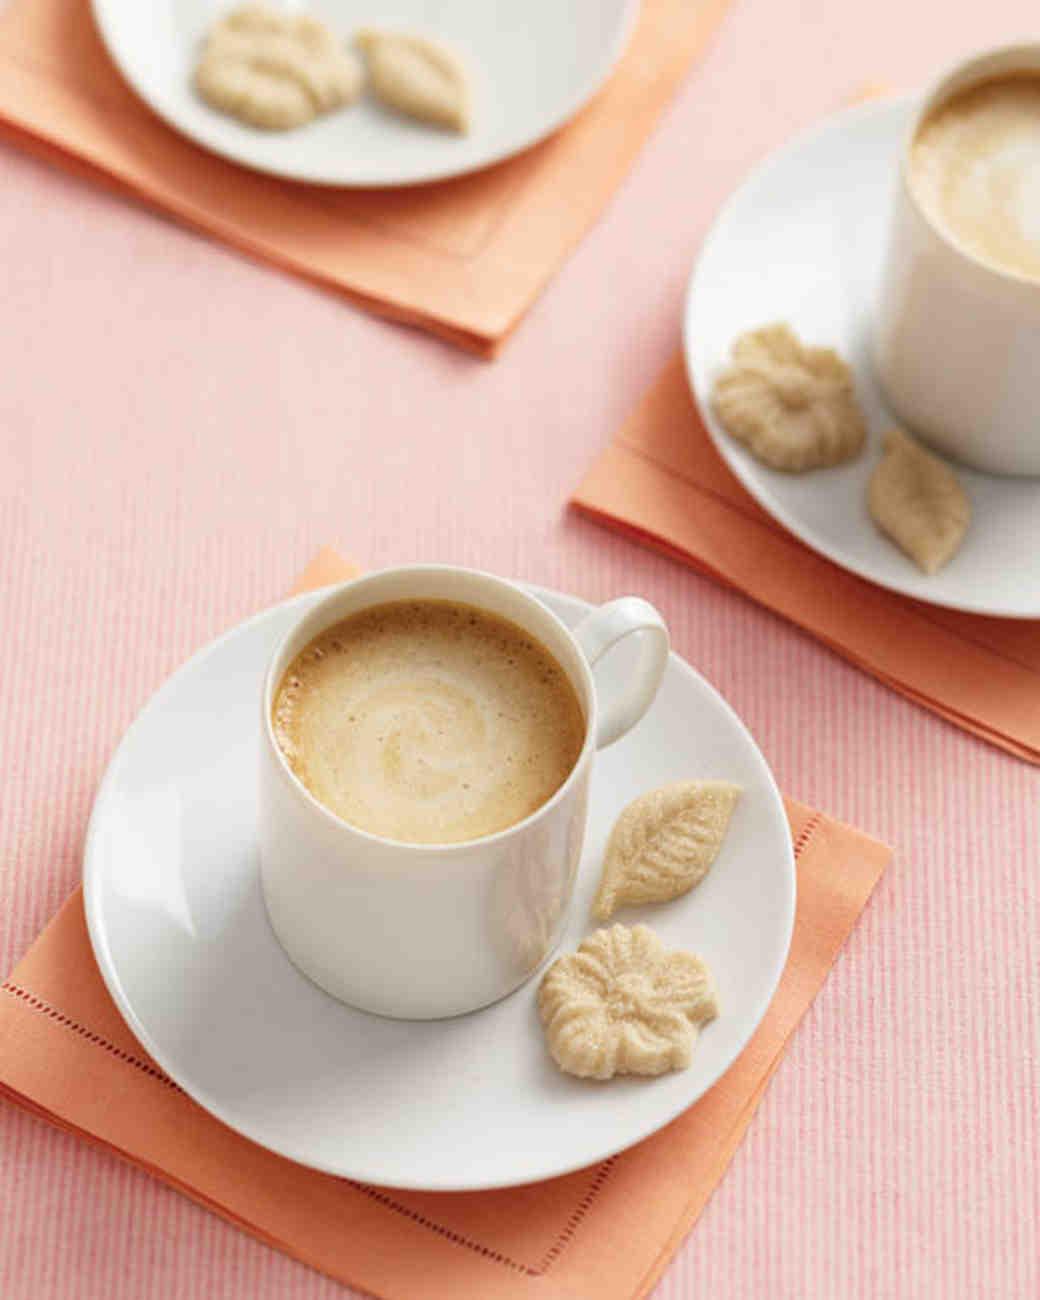 mwd106511_spr11_coffee1.jpg